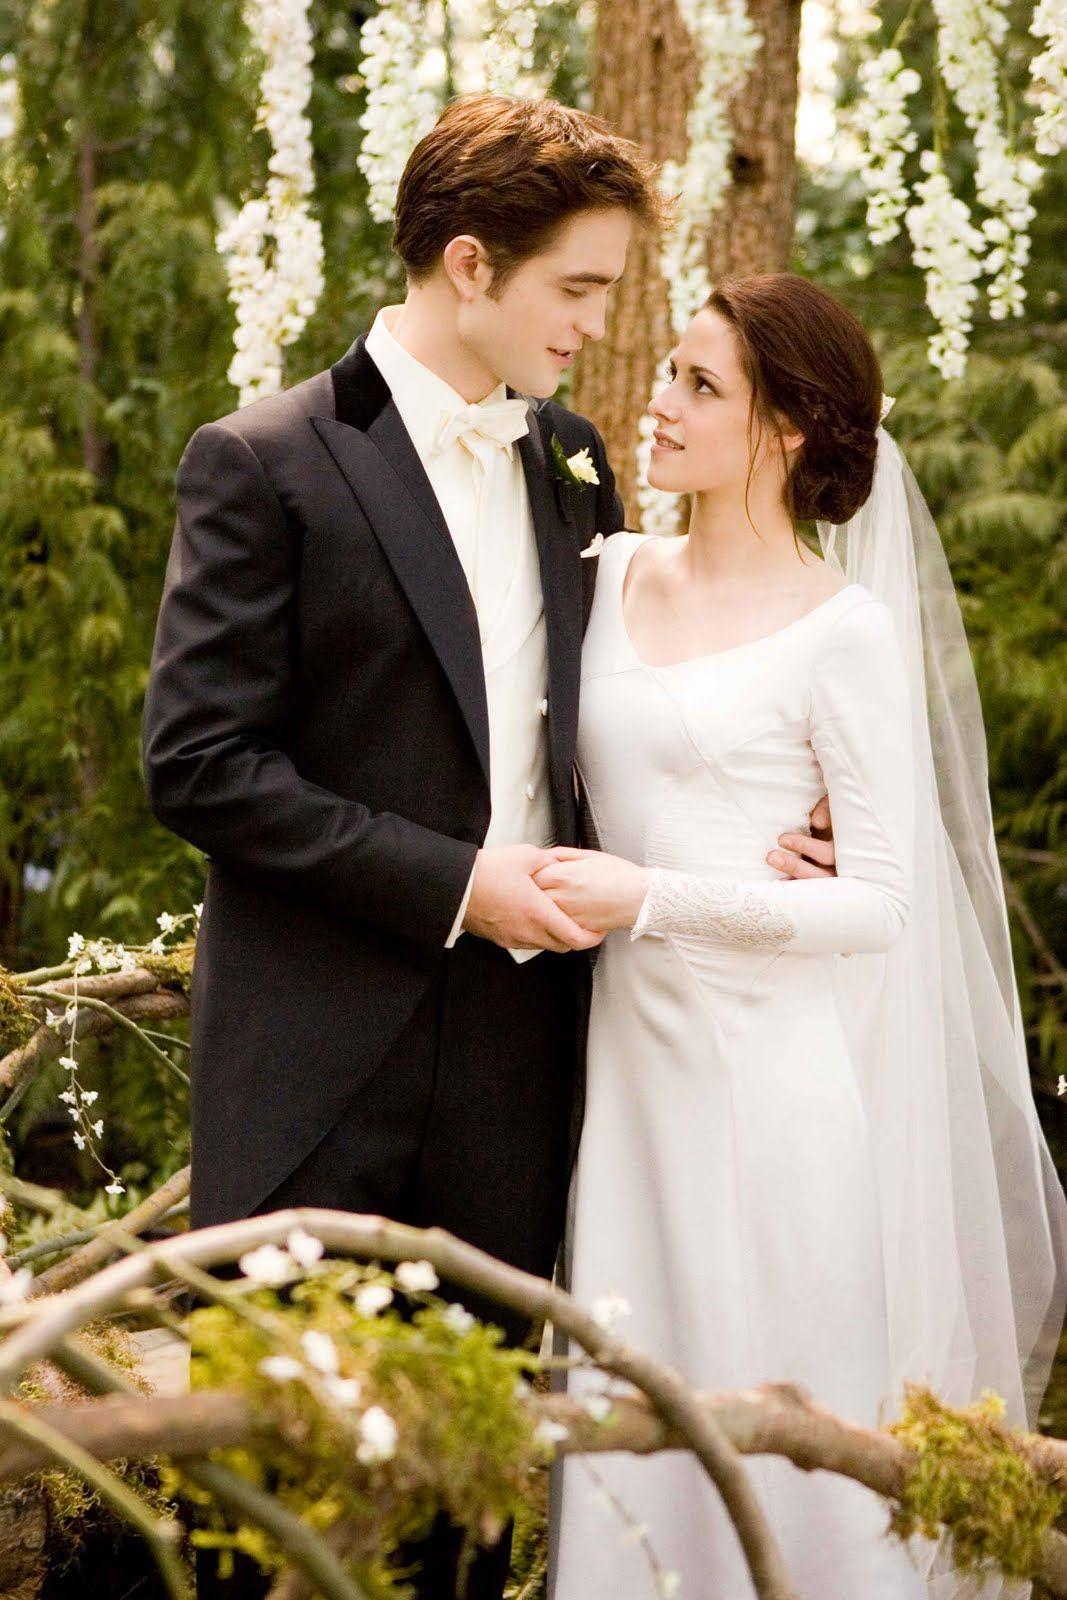 Kristen Stewart, de Bella Swan, en 'Amanecer, parte 1'